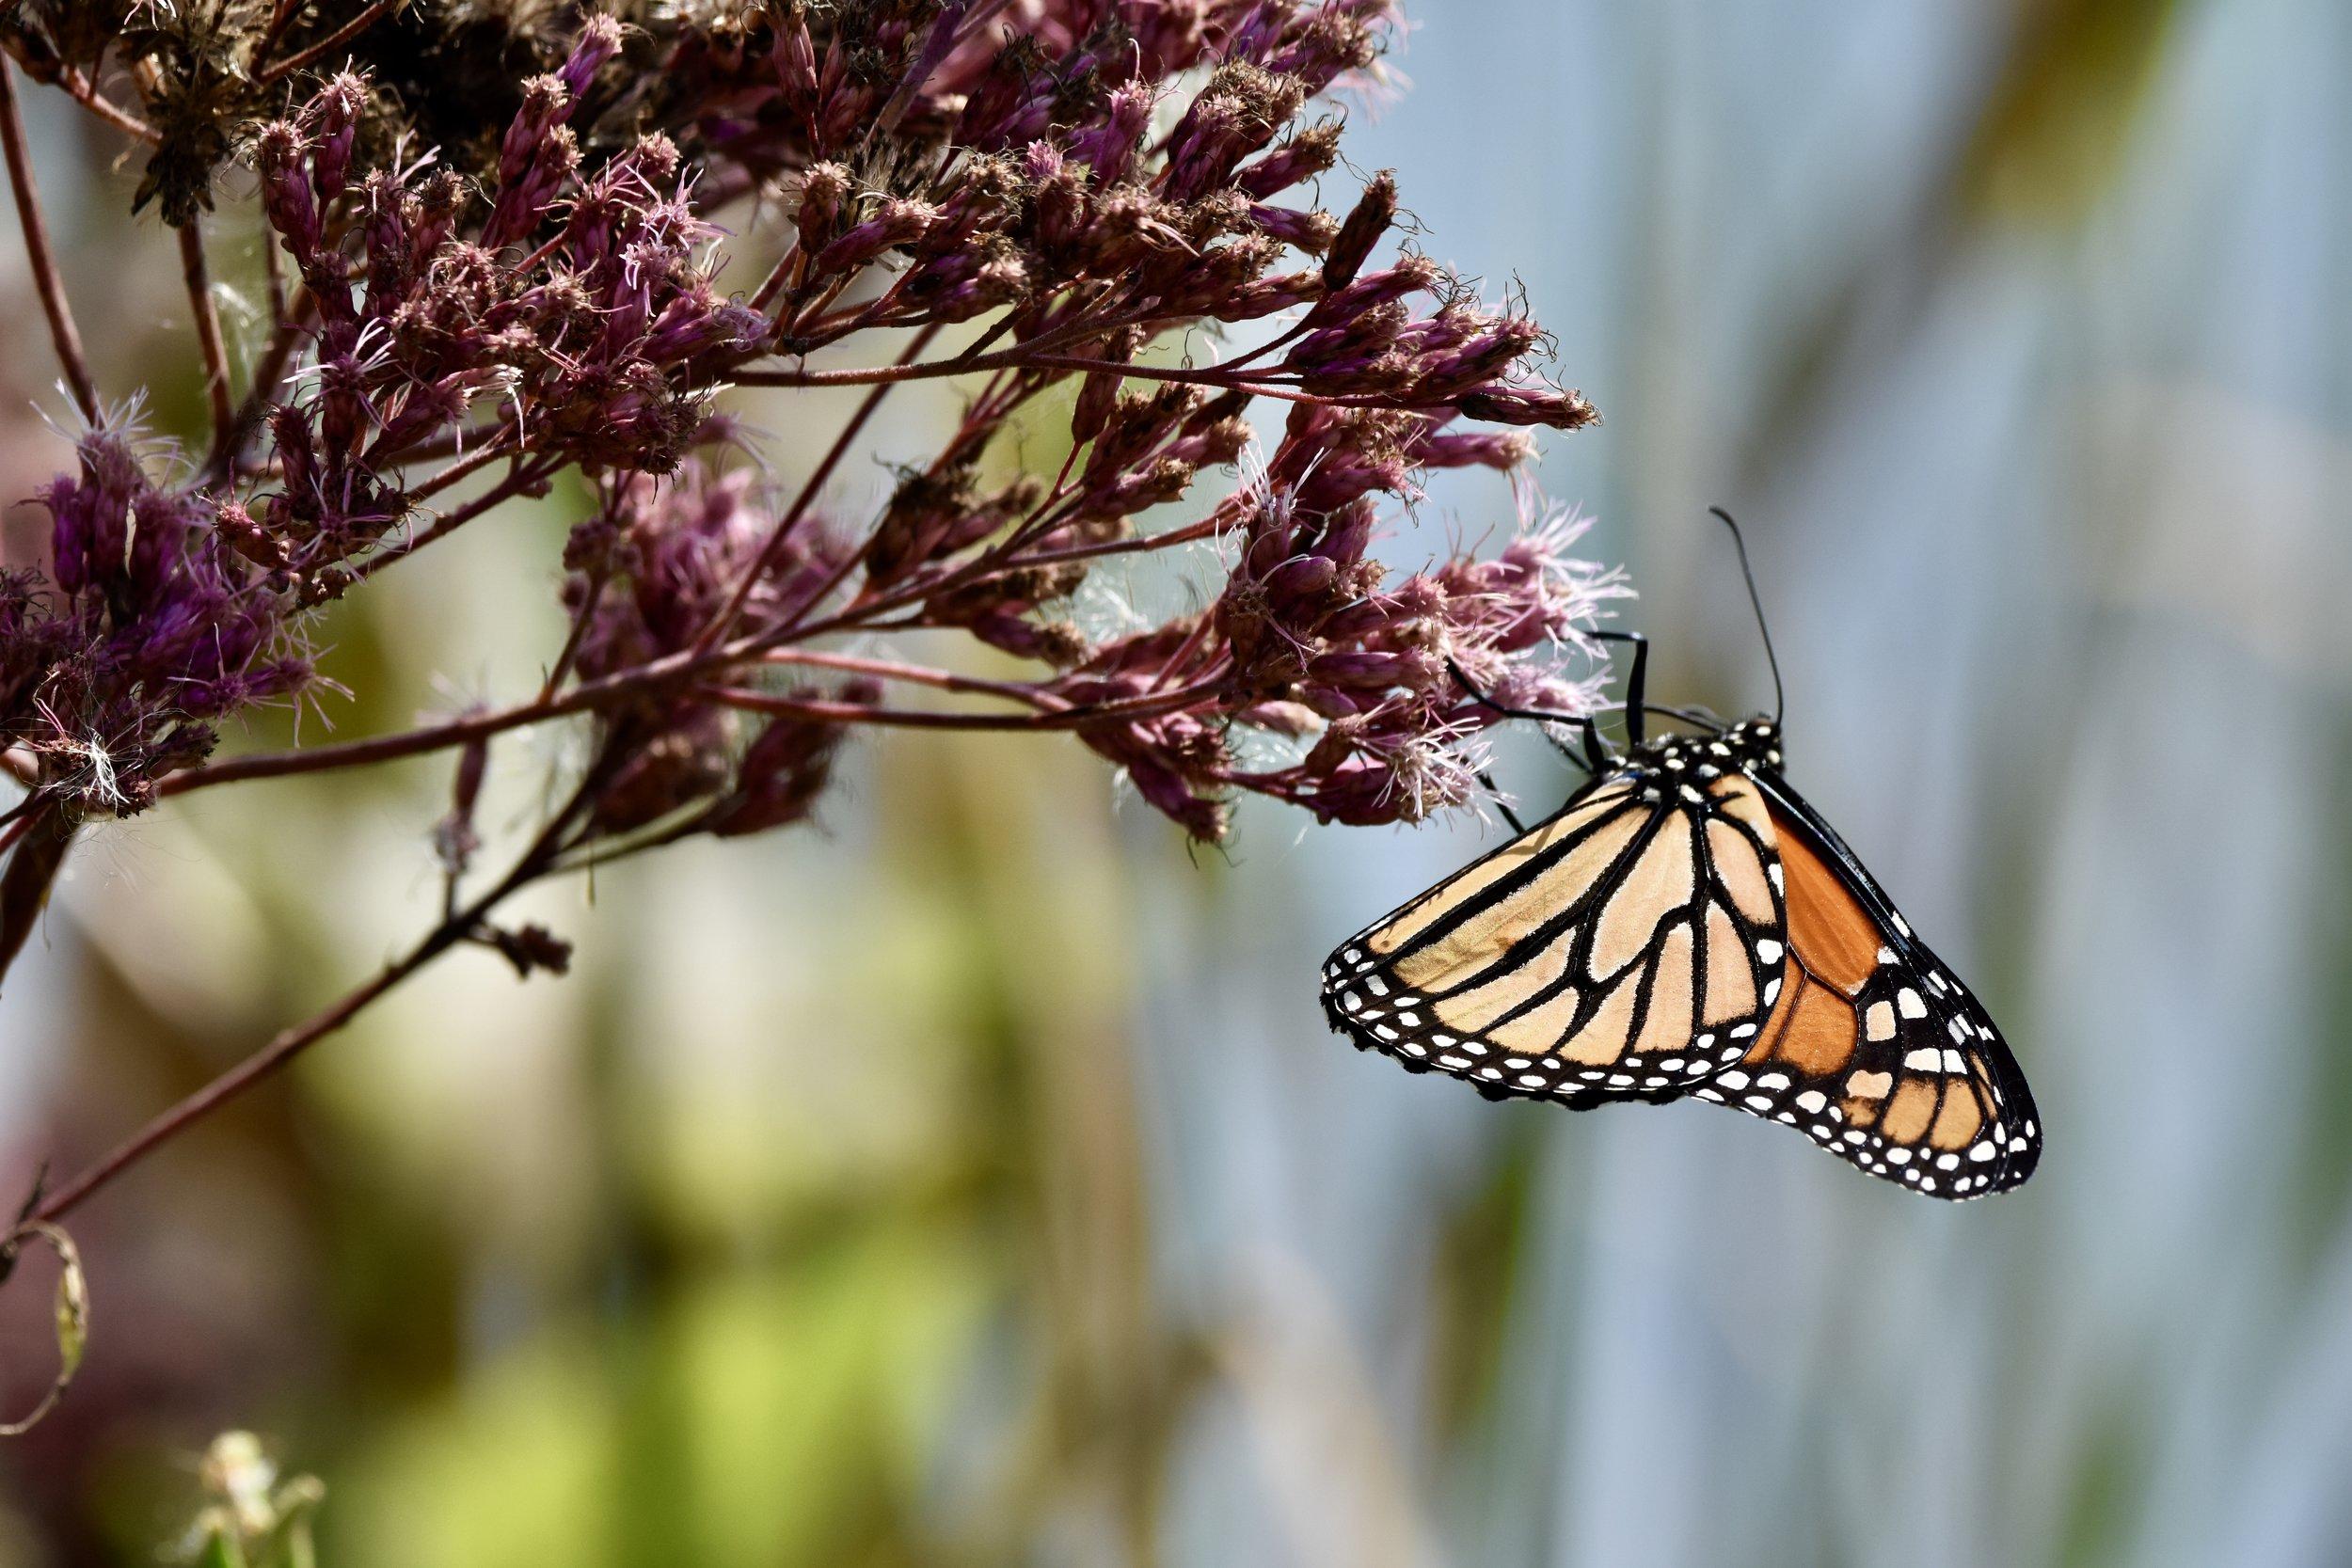 Monarch butterfly or simply  monarch  (Danaus plexippus)